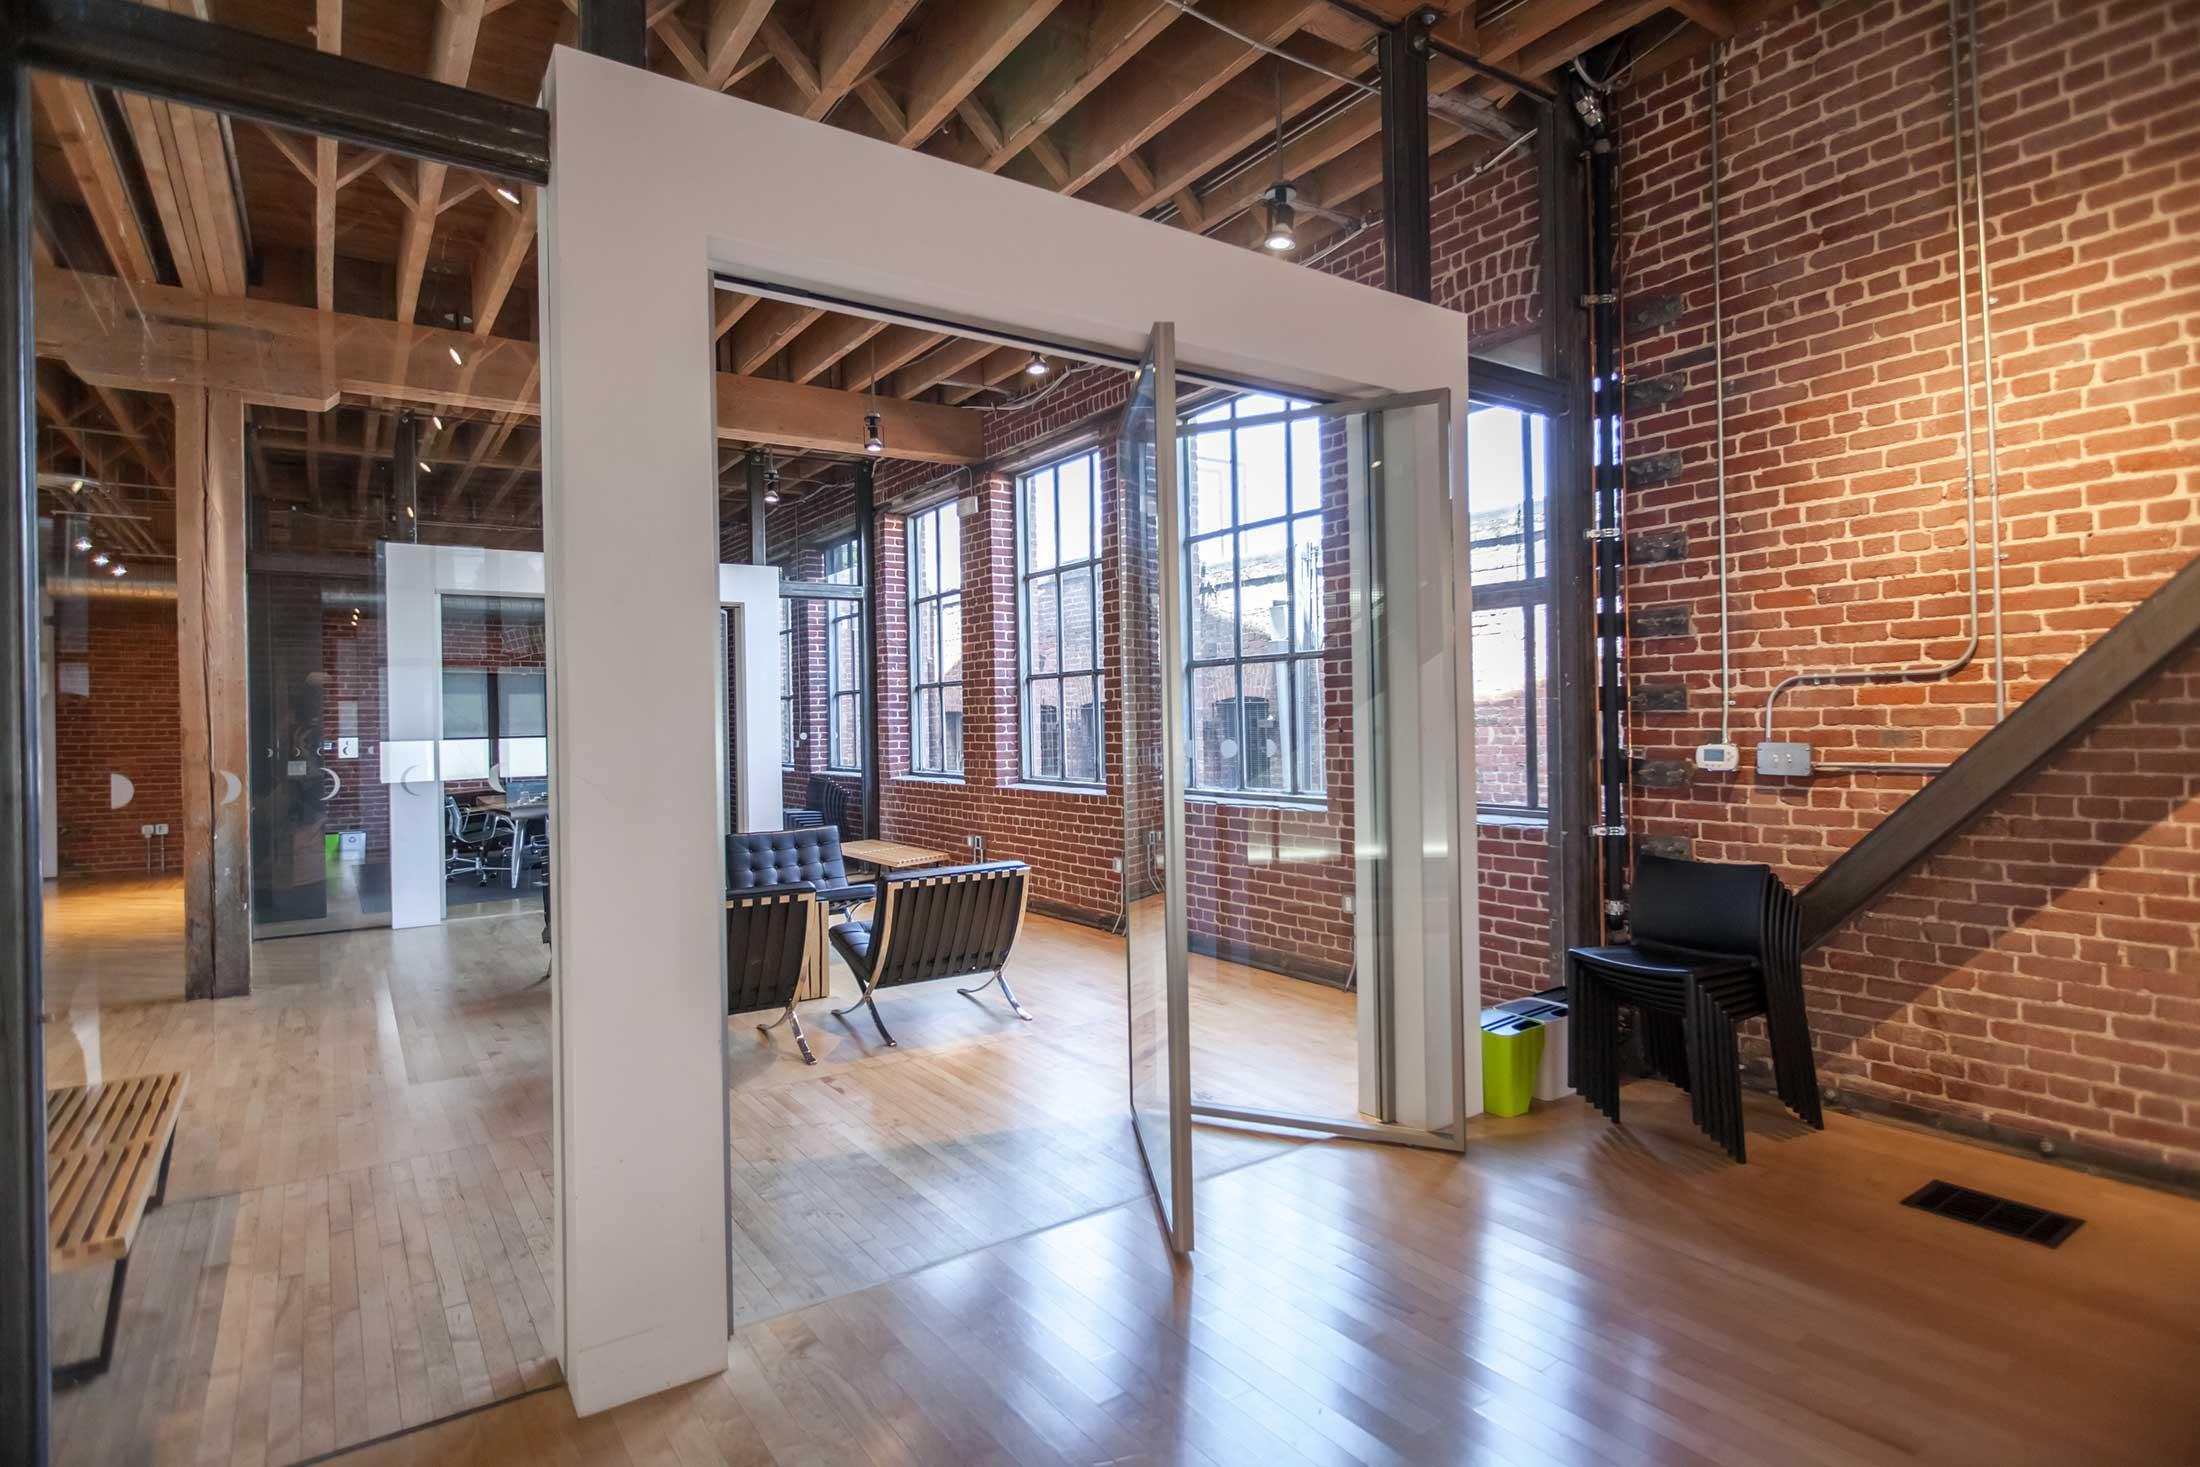 Lunar design shubin donaldson - Commercial interior design chicago ...